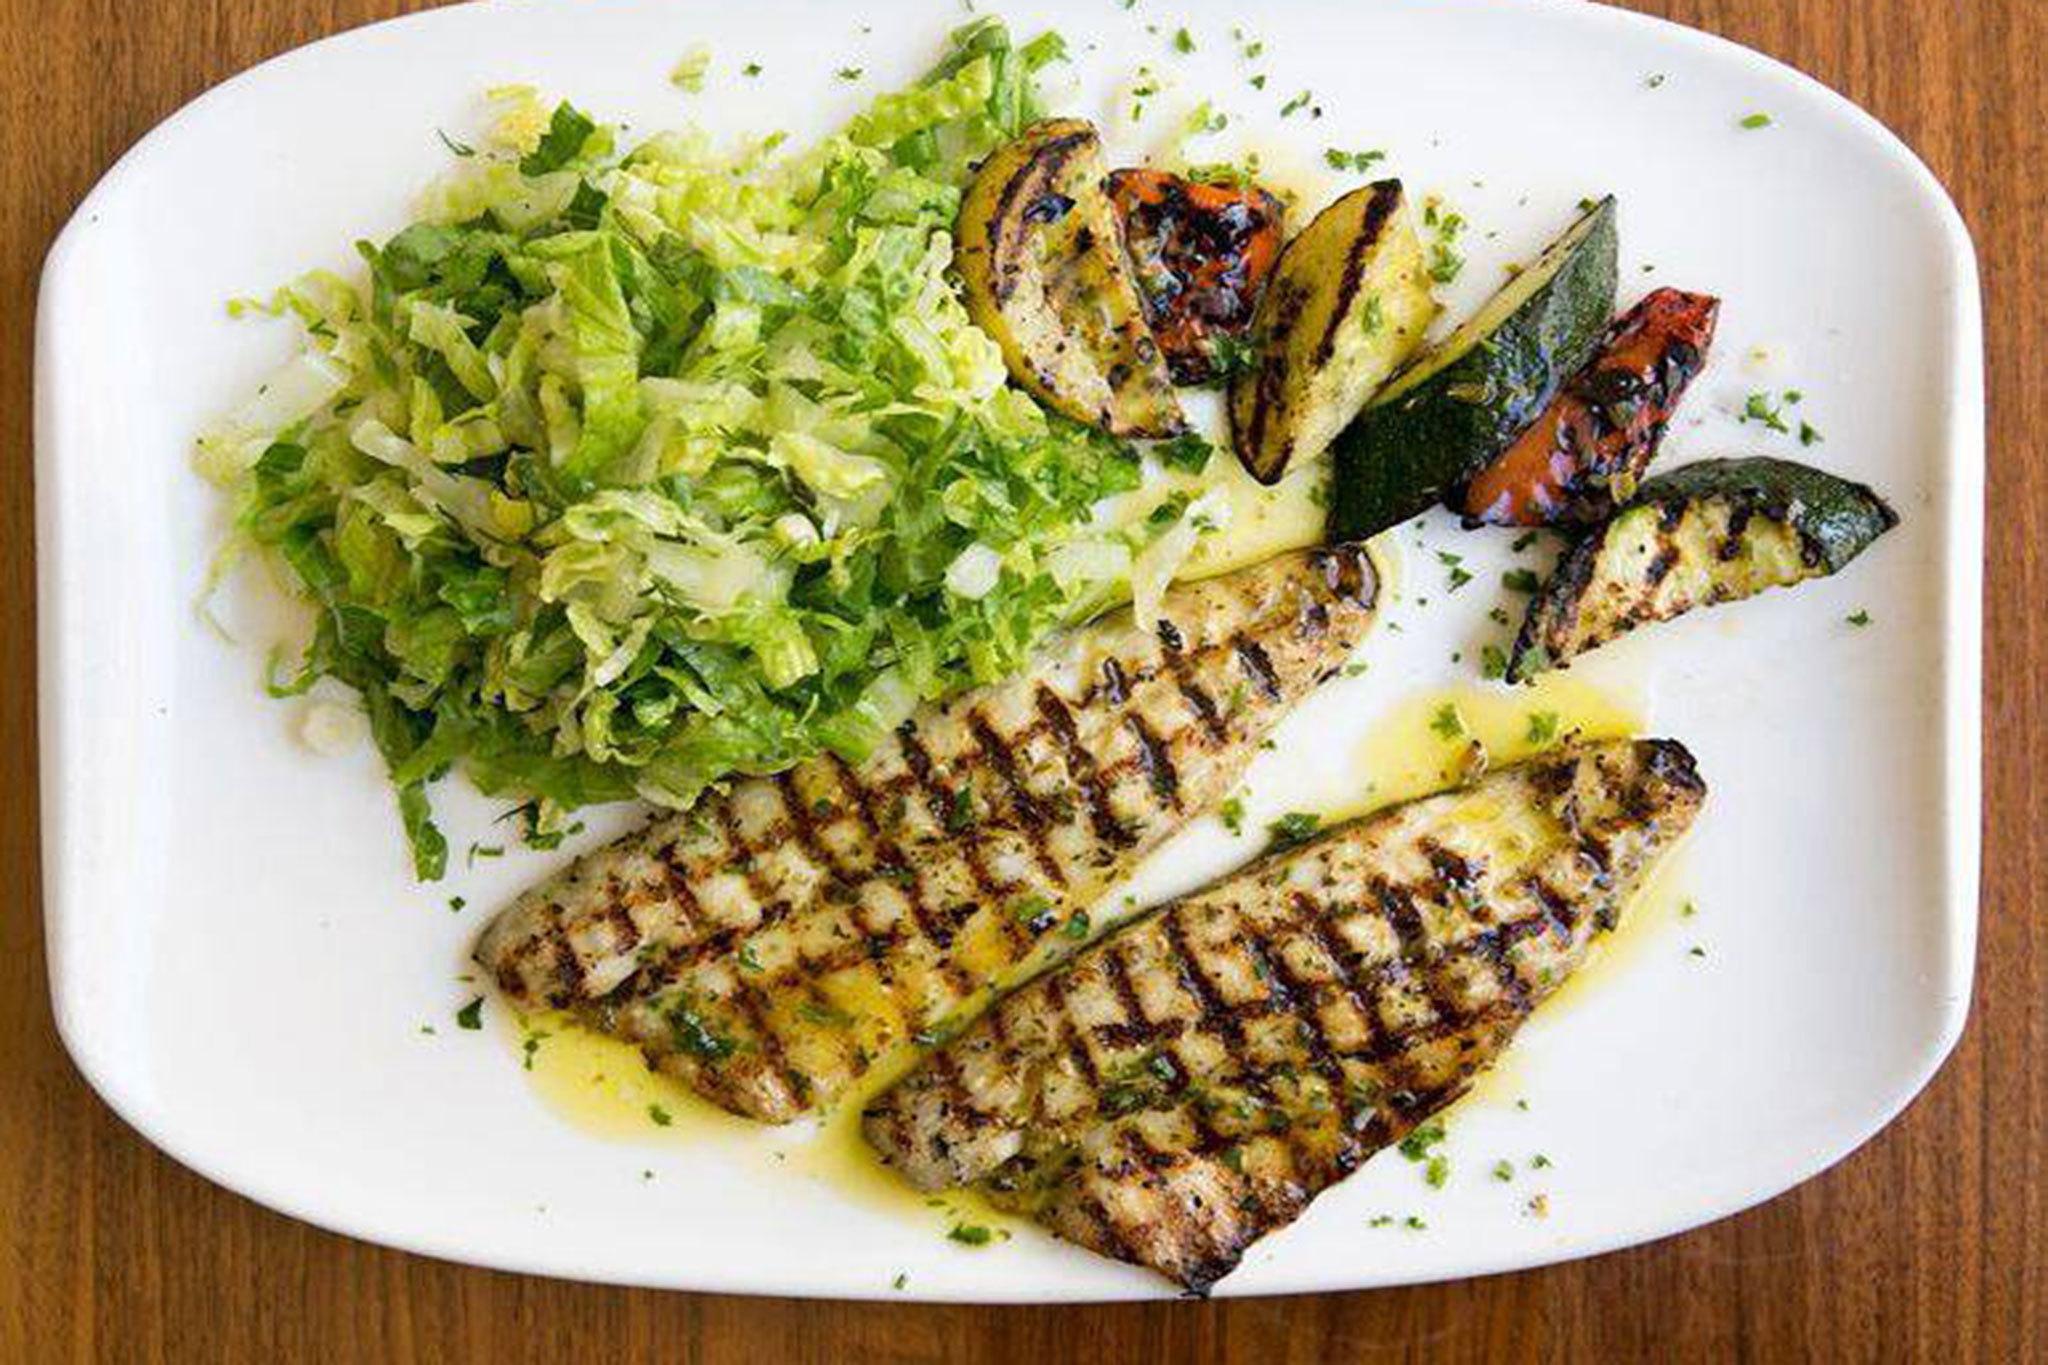 Petros Greek Cuisine